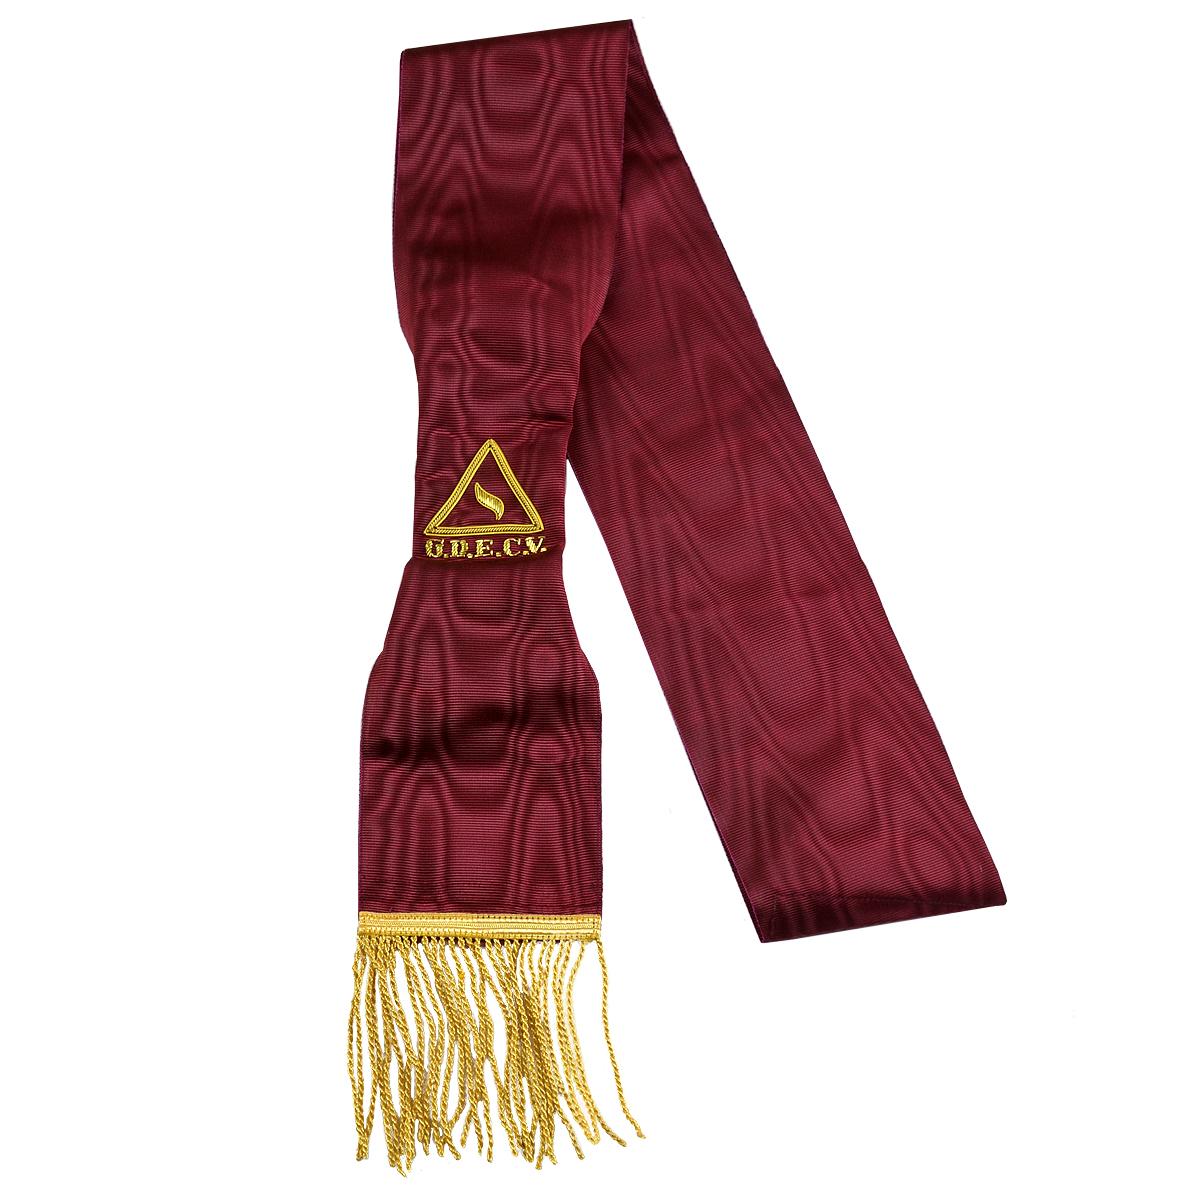 14th Degree Lodge of Perfection Sash